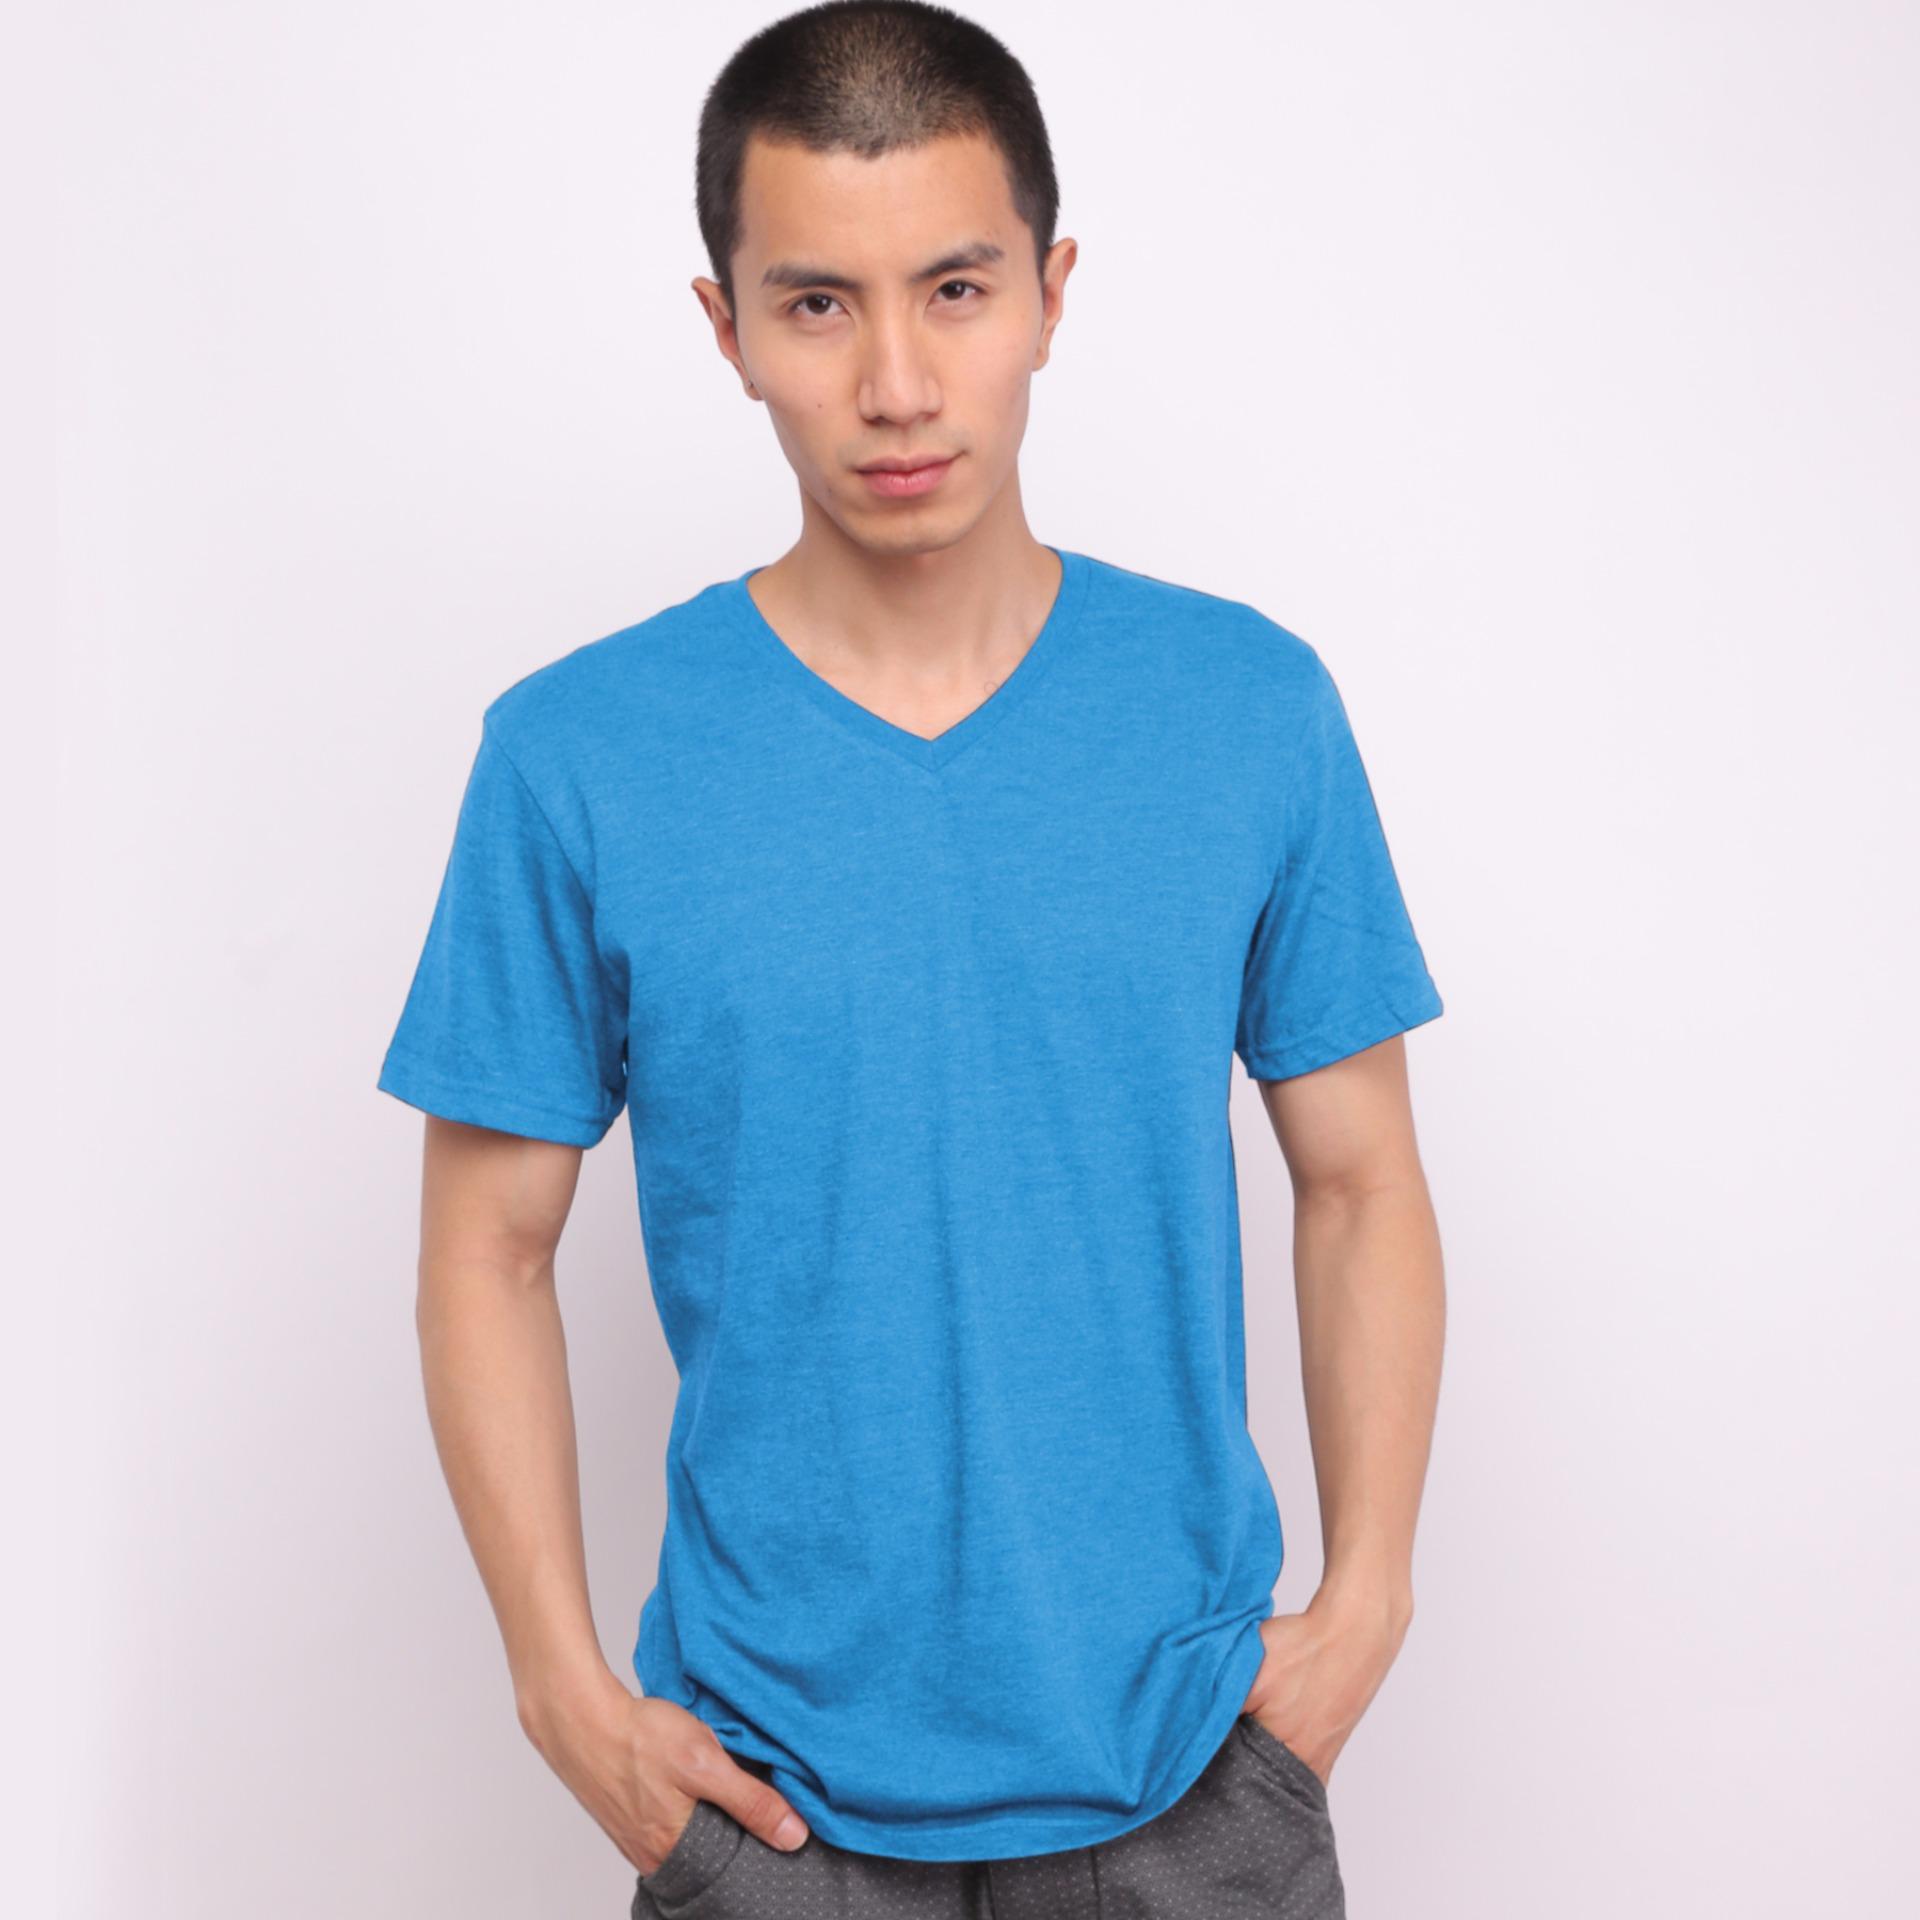 Belanja Murah Muscle Fit Kaos Polos T Shirt V Neck Lengan Pendek Green Misty Cotton Biru